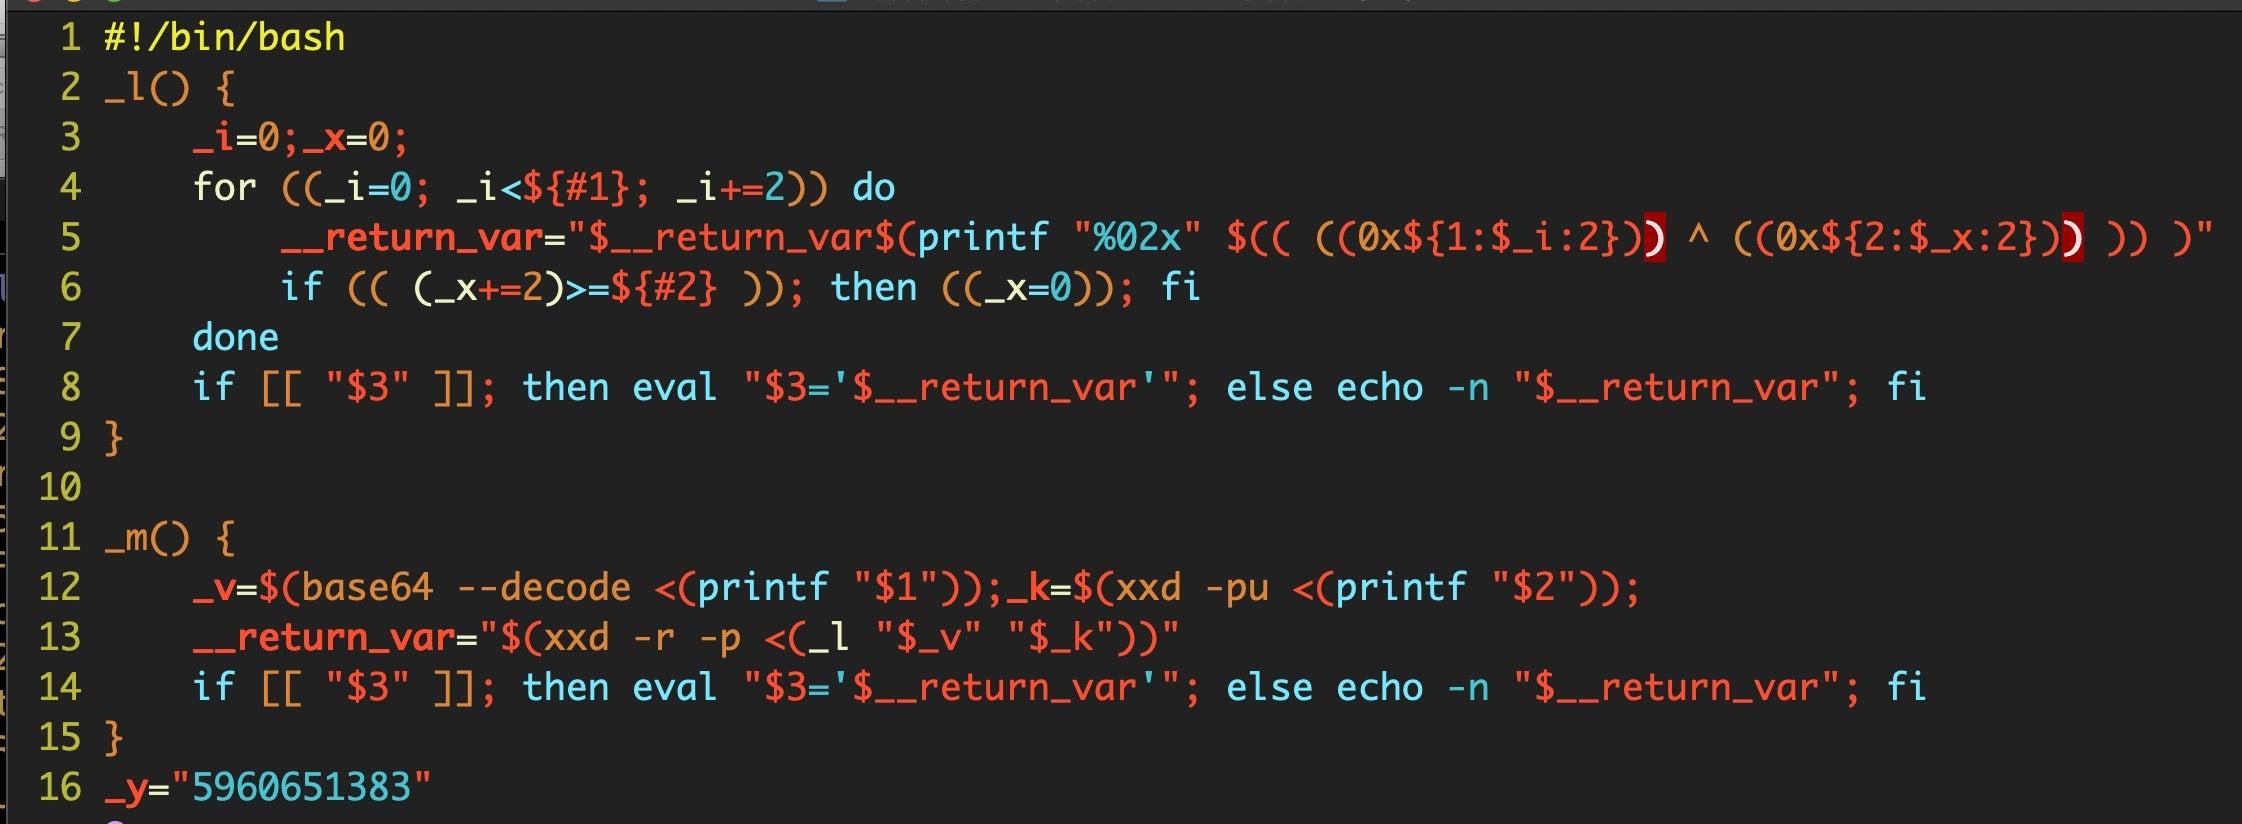 image of shlayer_d embedded script